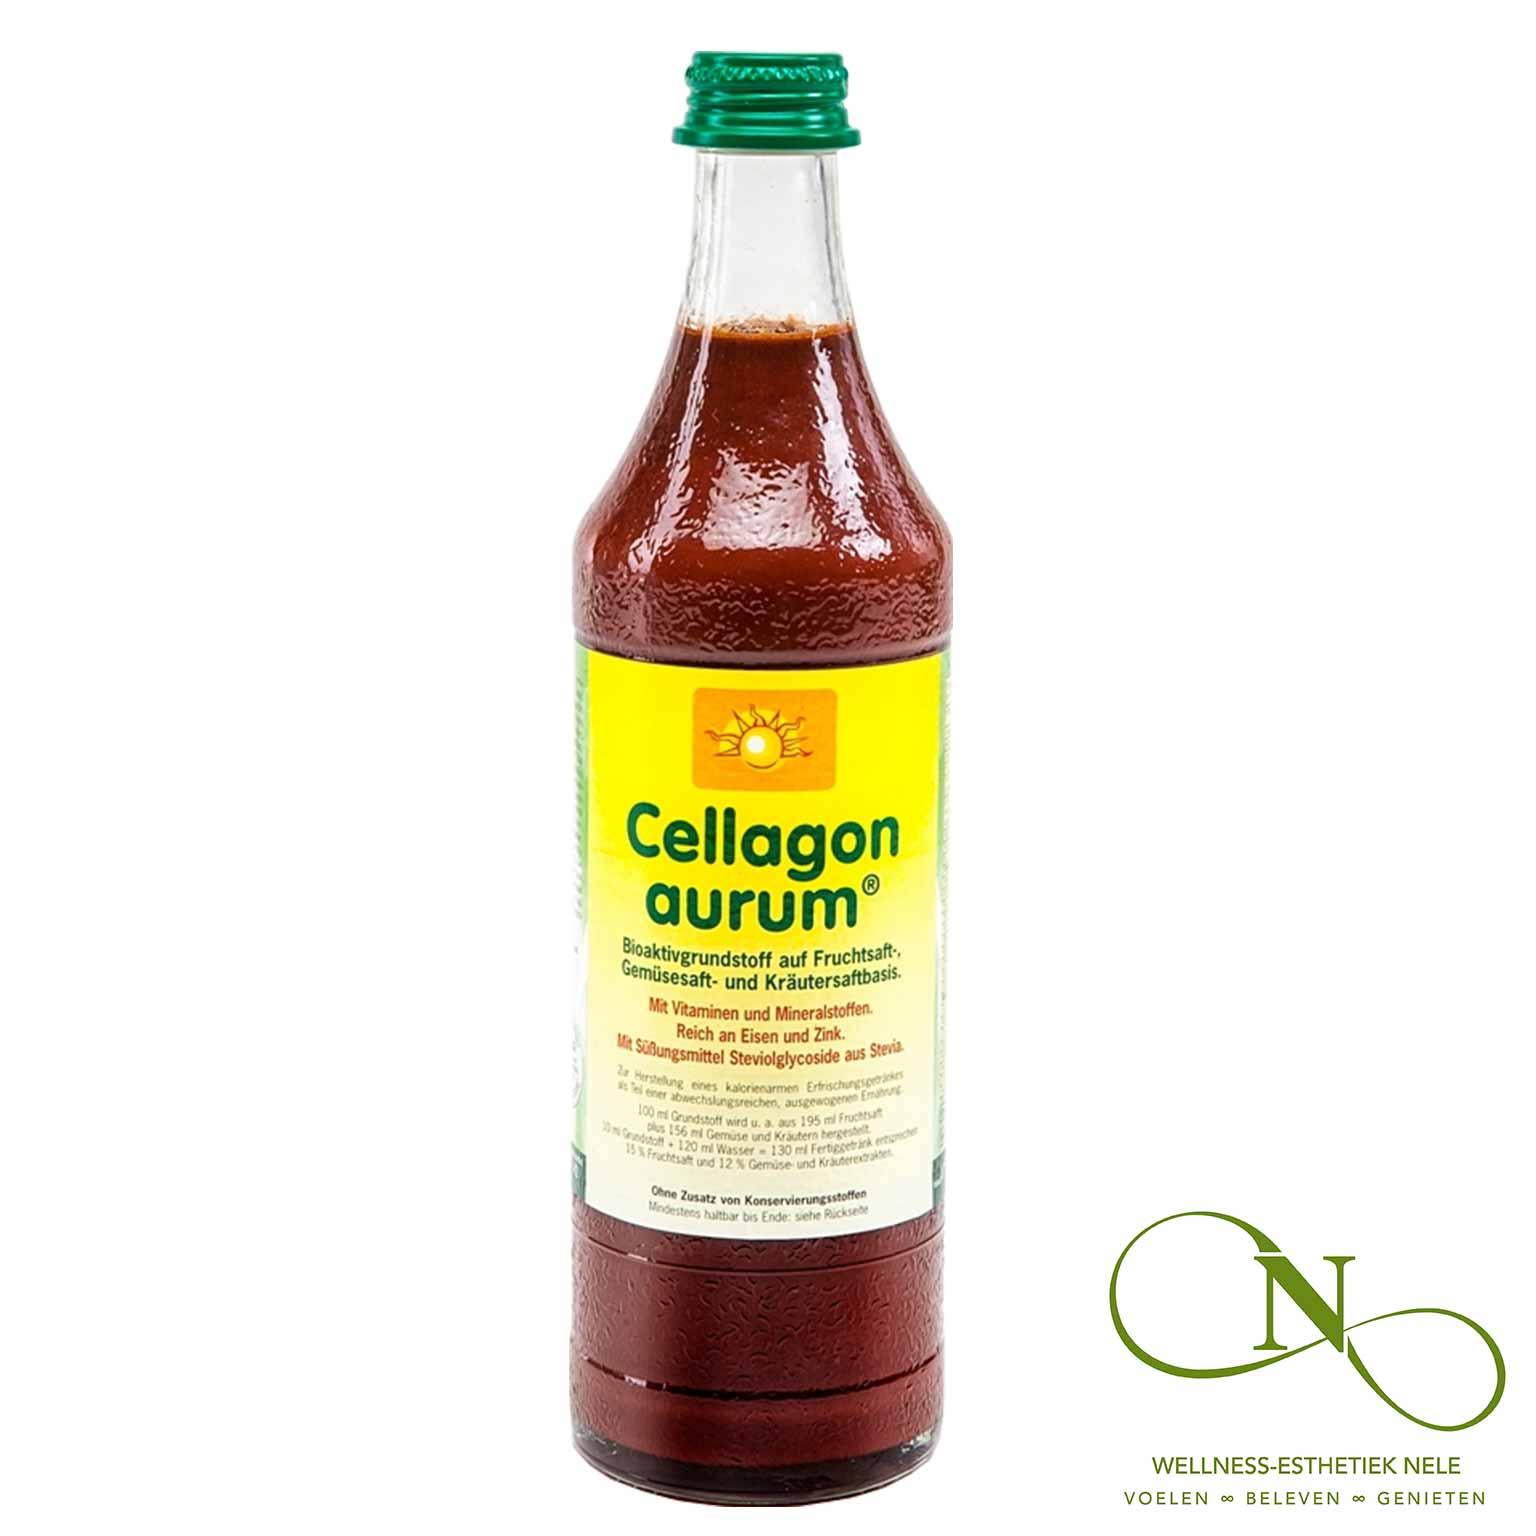 Cellagon-Aurum-Wellness-Esthetiek-Nele